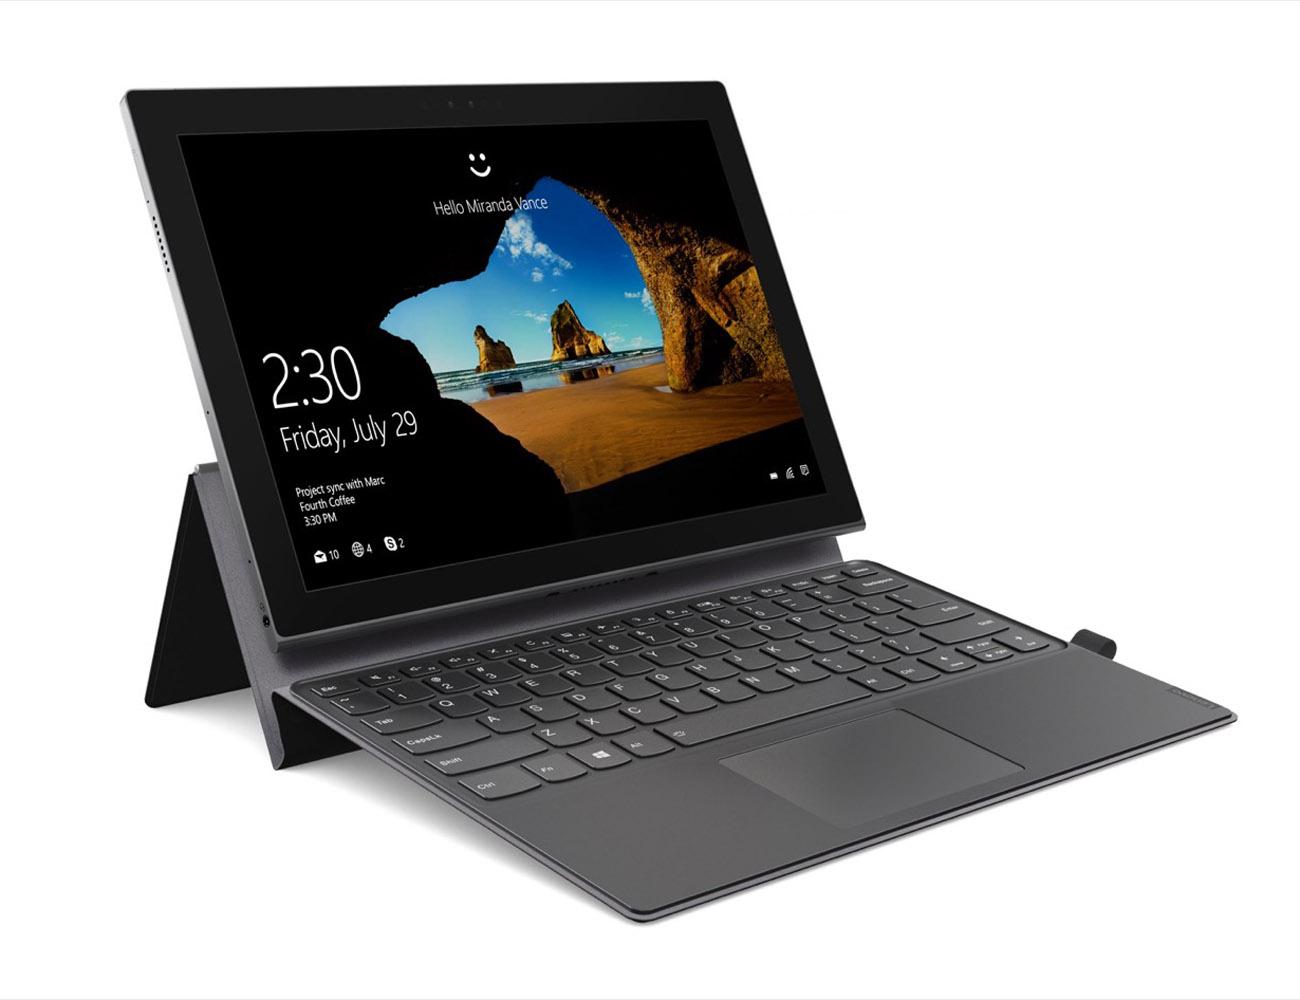 Lennvo Miix 630 2-in-1 Hybrid Laptop